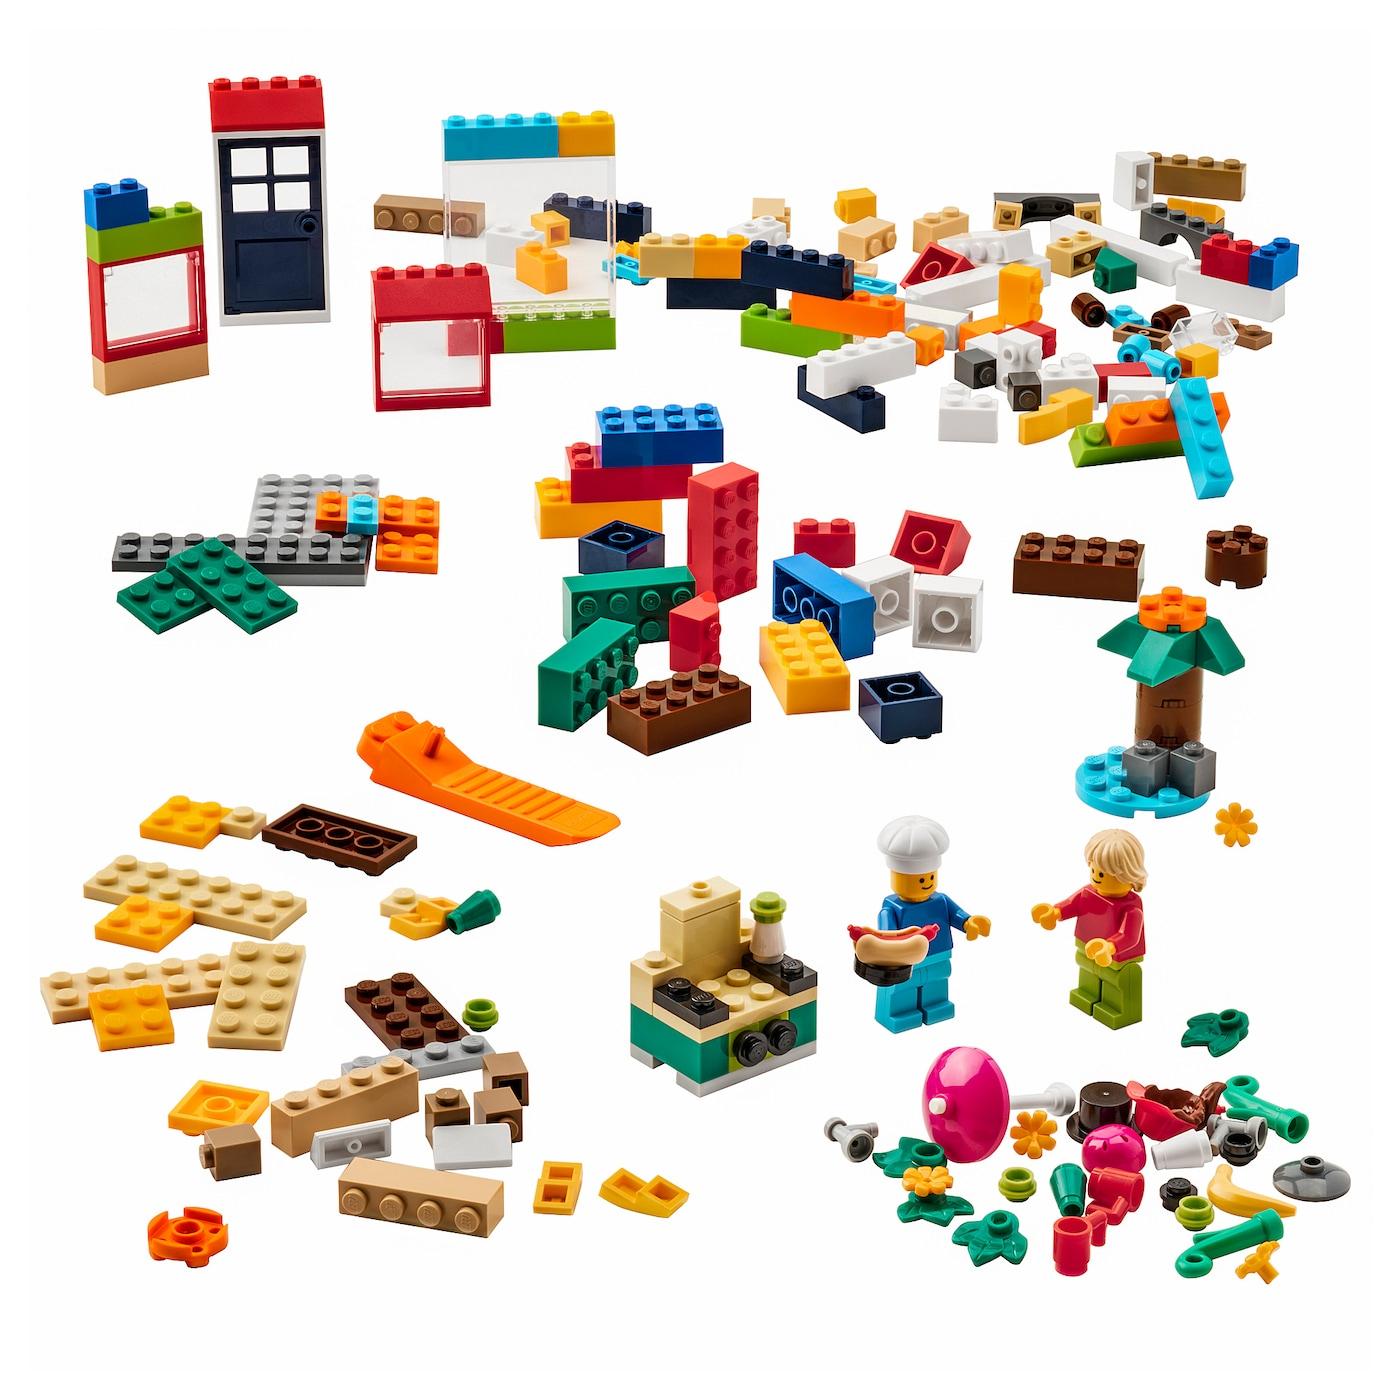 201 delig LEGO pakket @ Ikea